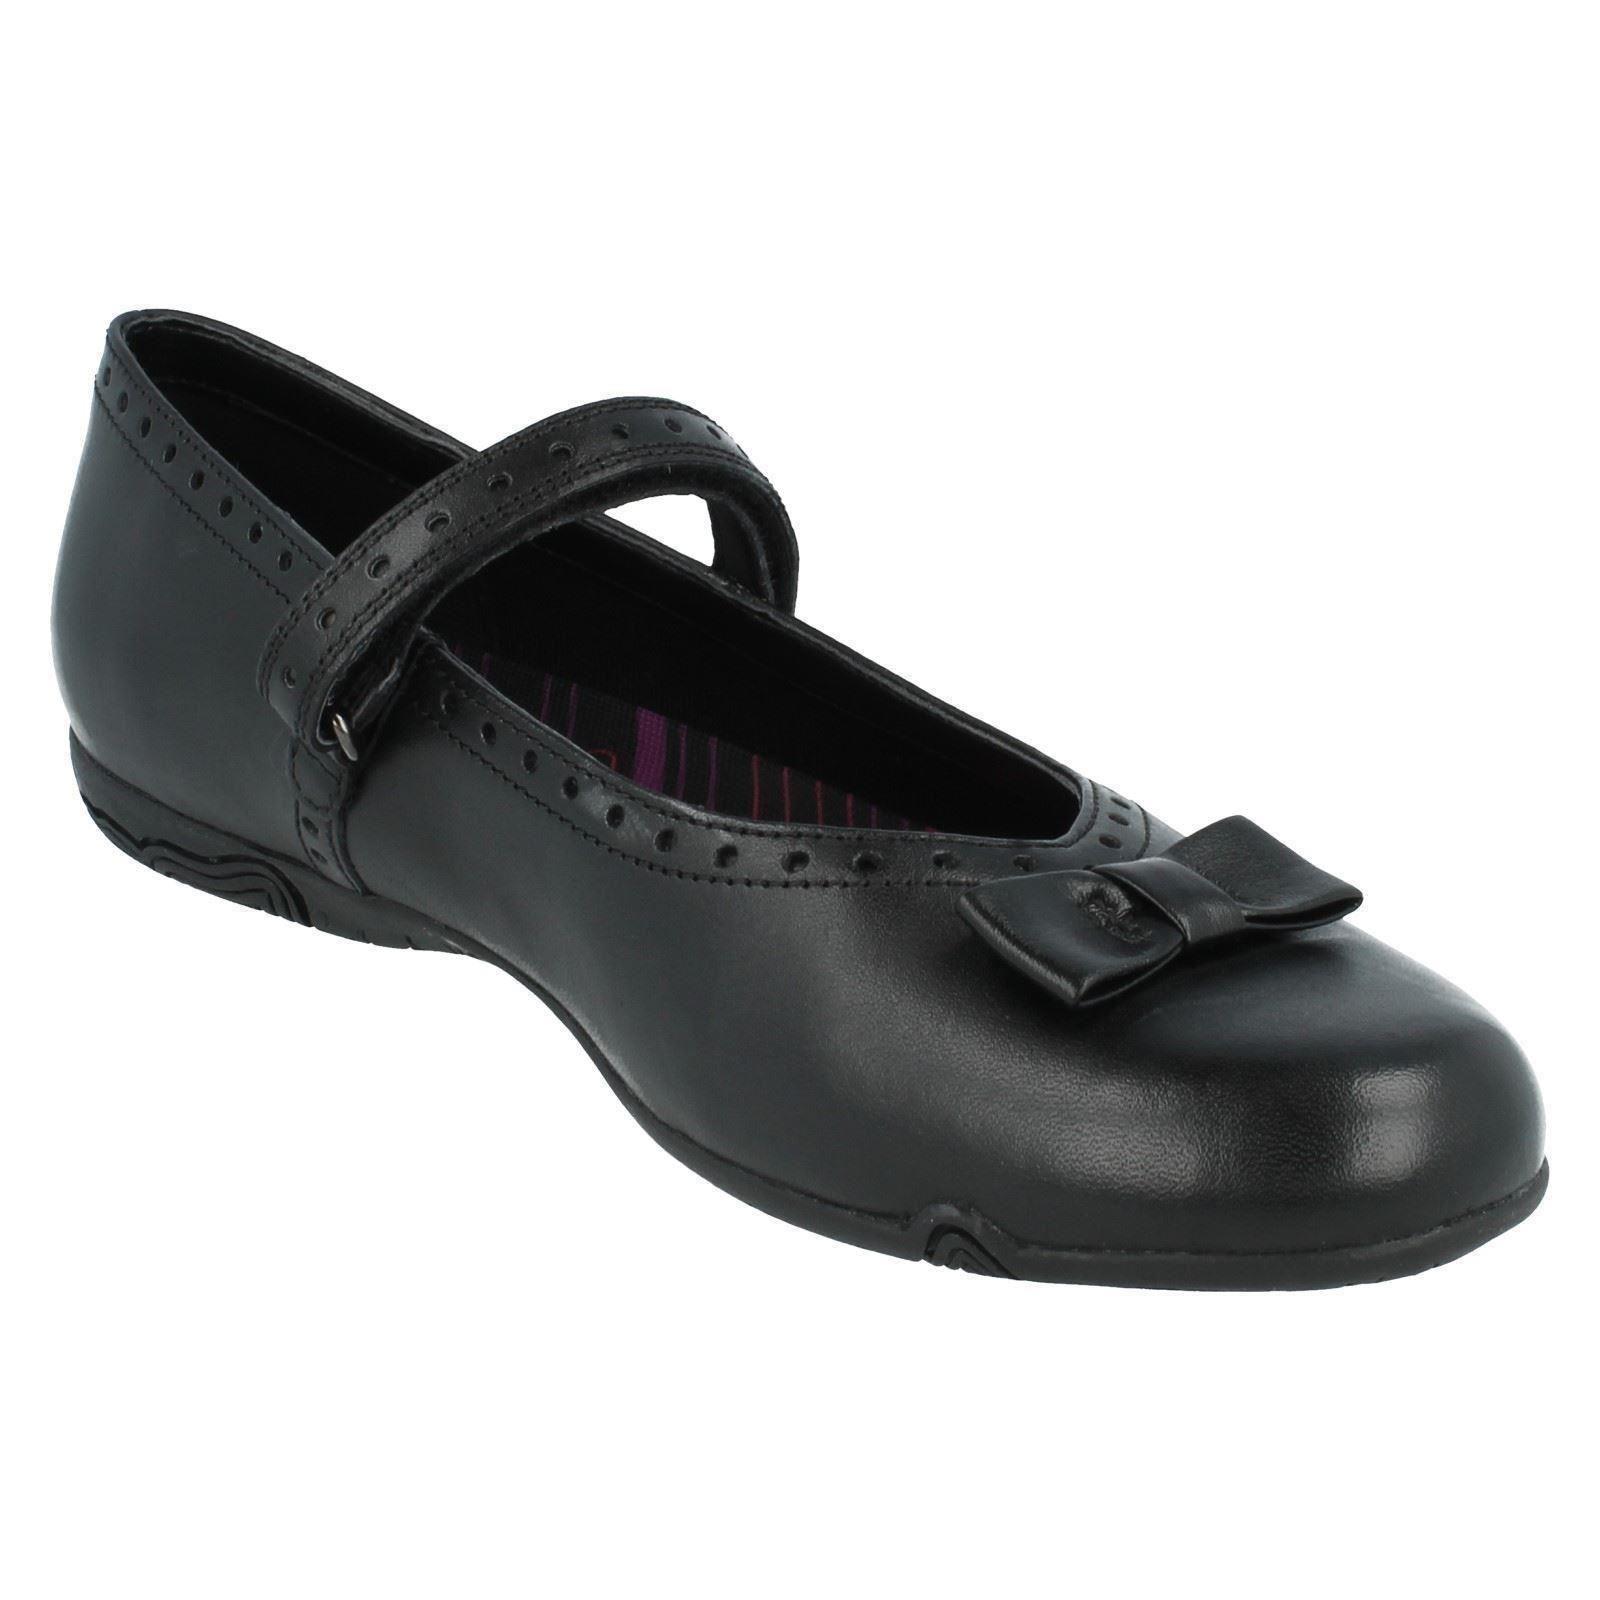 Clarks Air Norfolk Bl Black Shoes